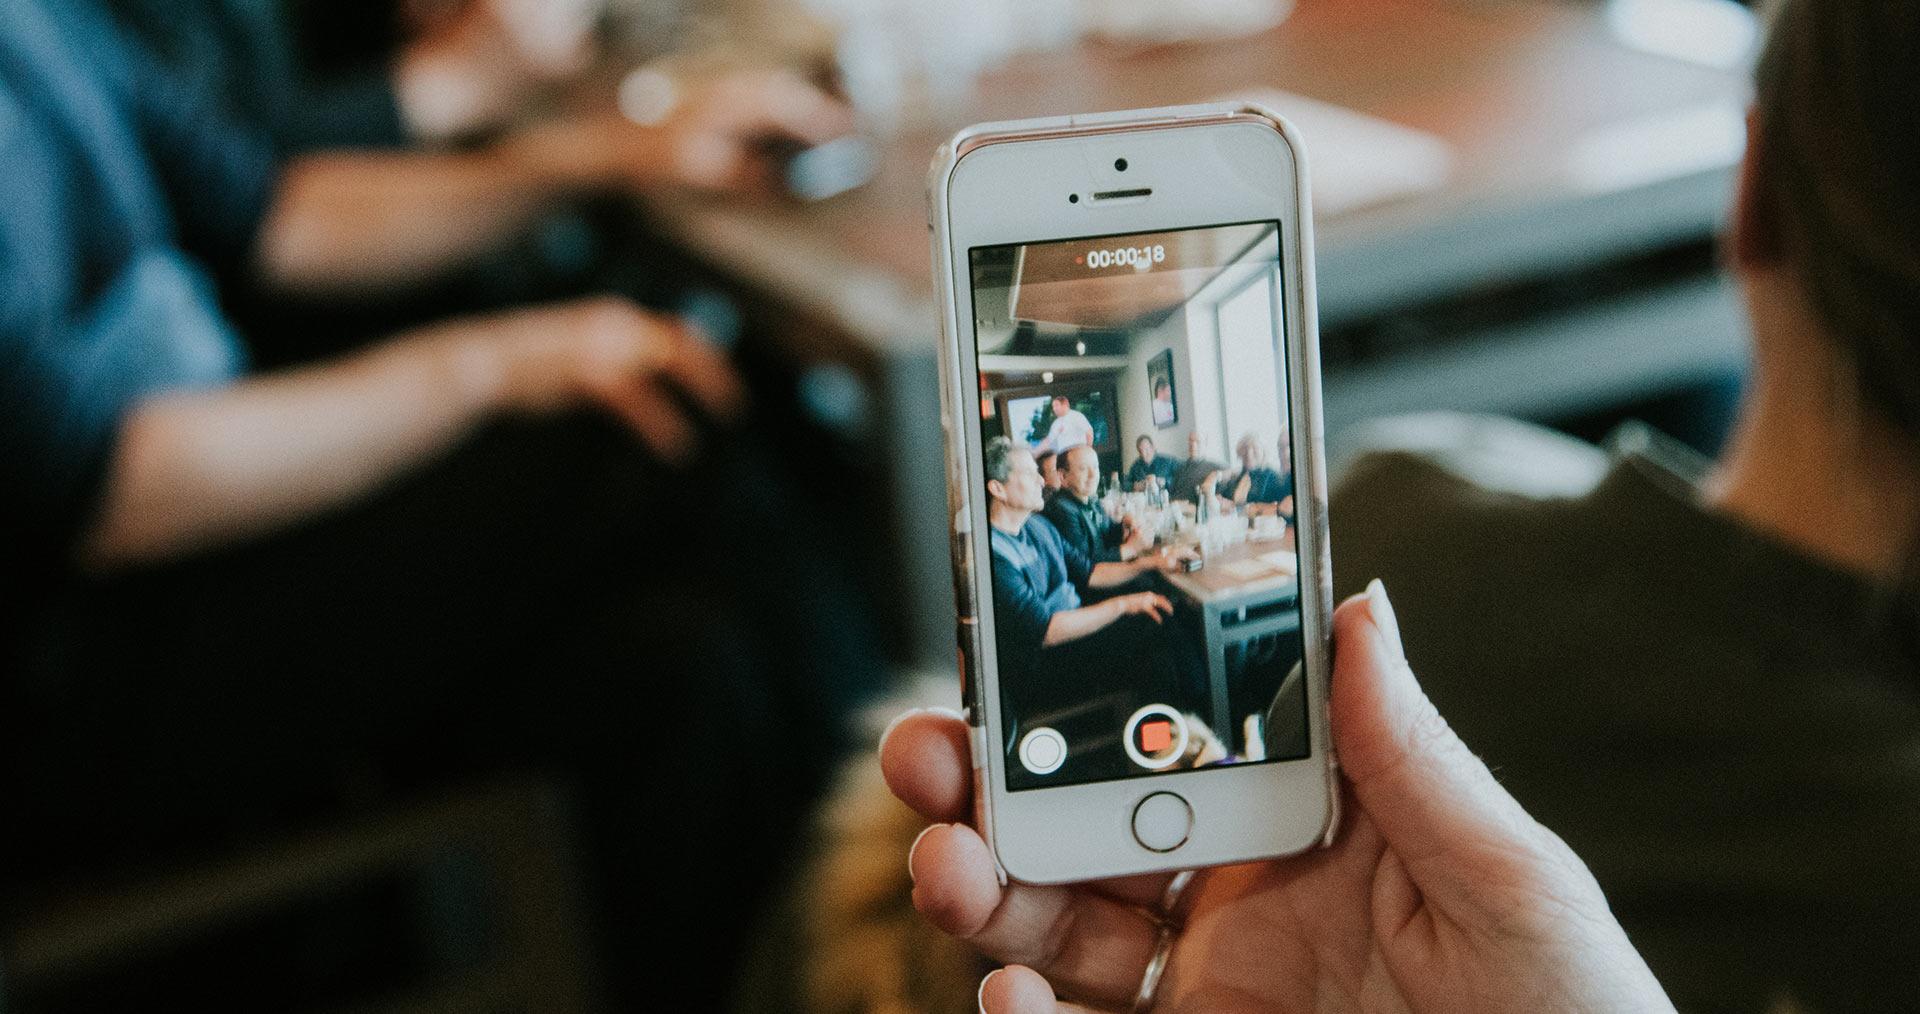 mobile video filming - nexd blog post